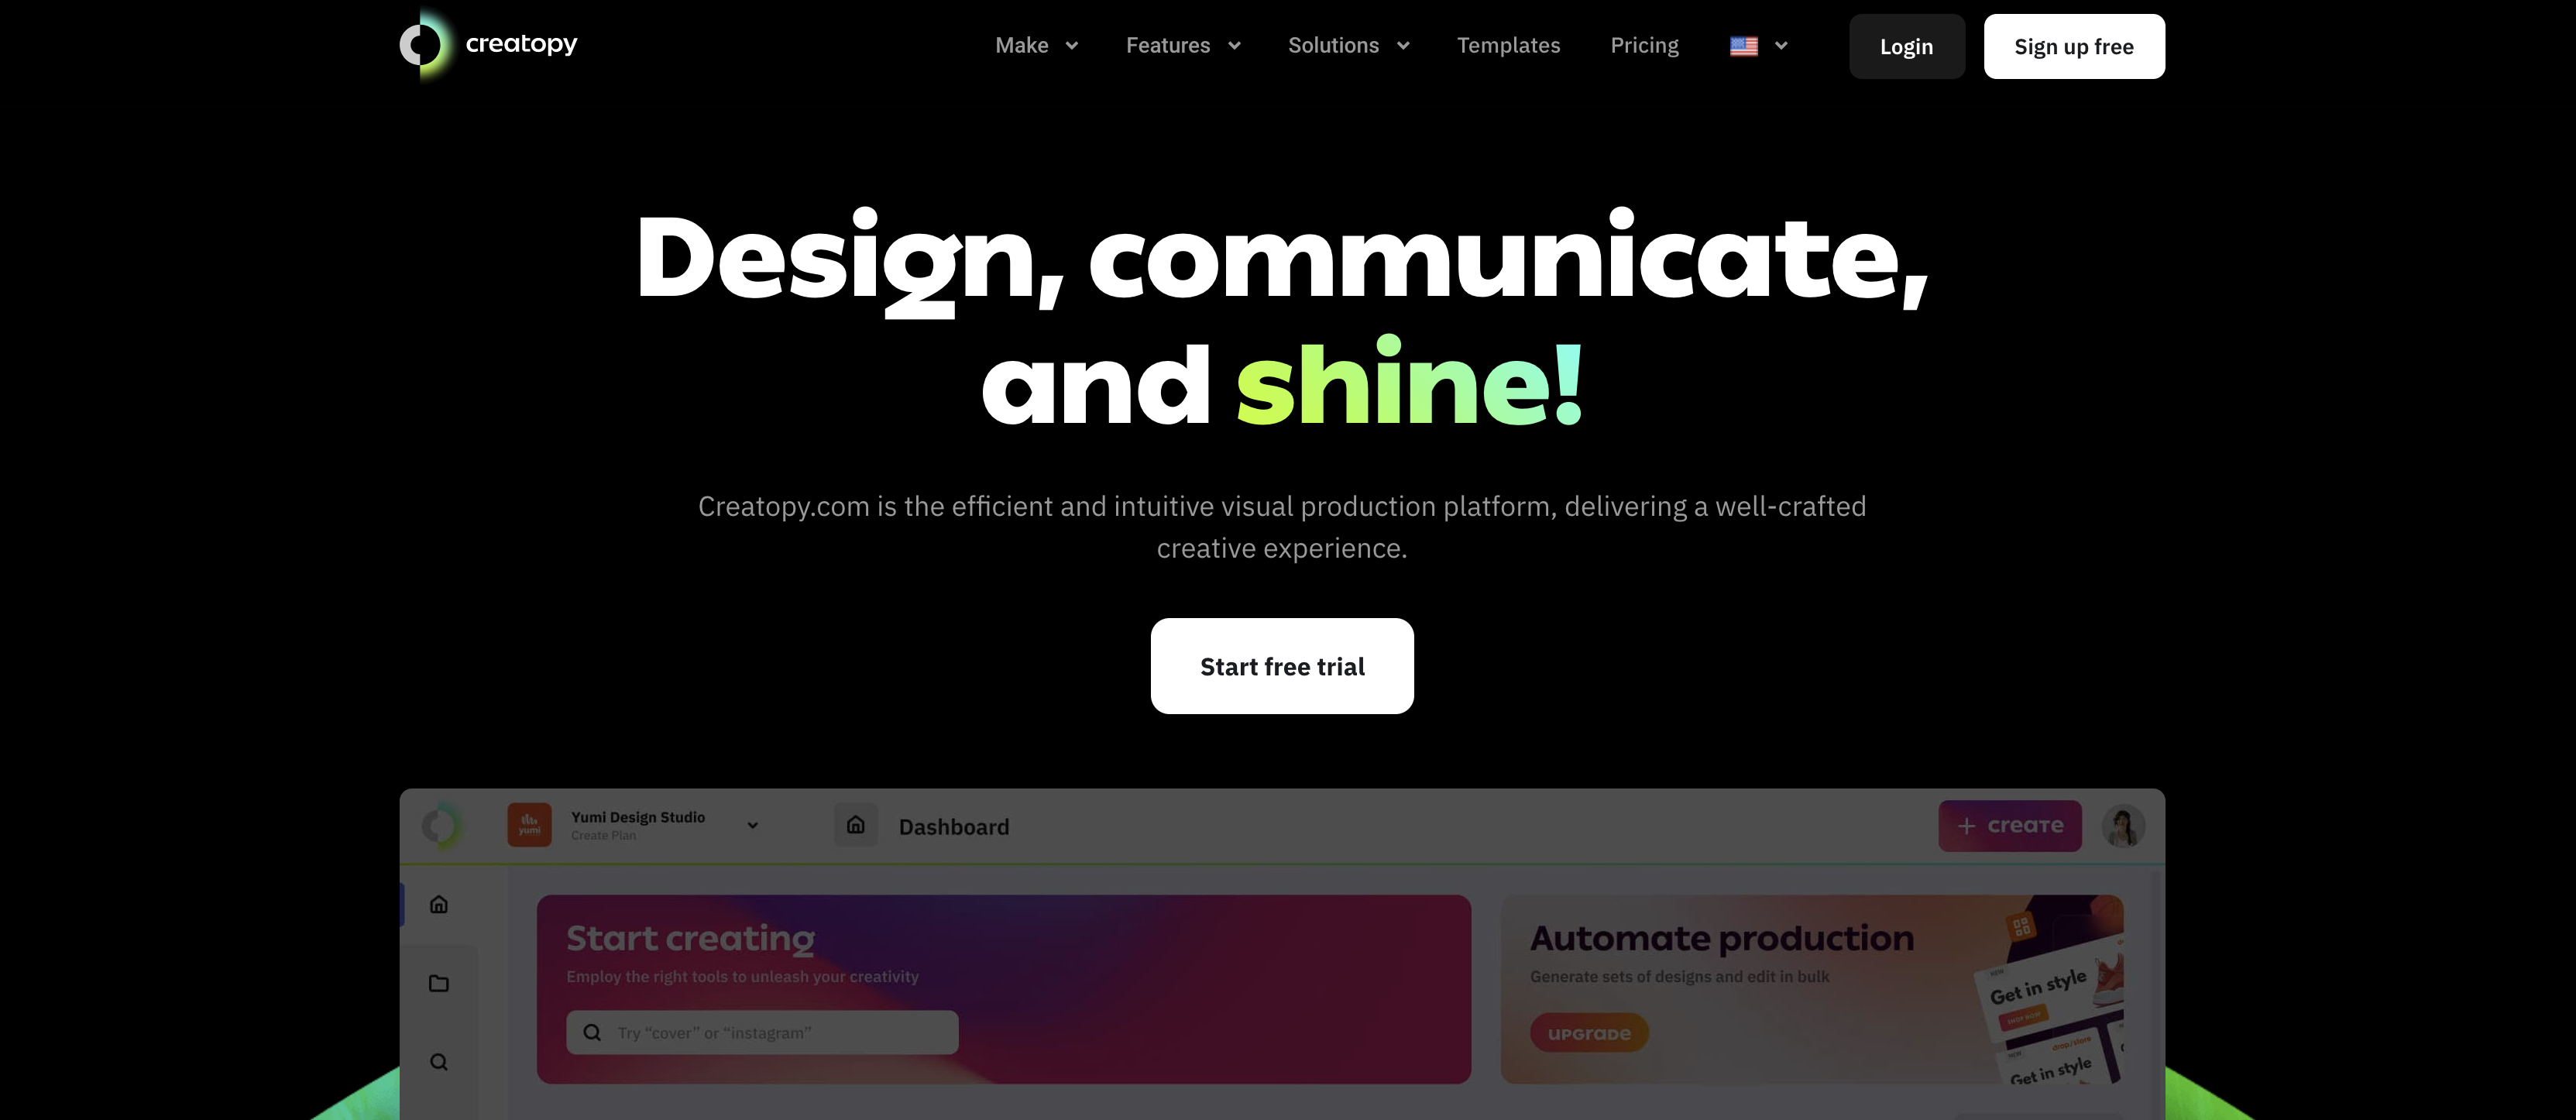 Creatopy homepage screenshot